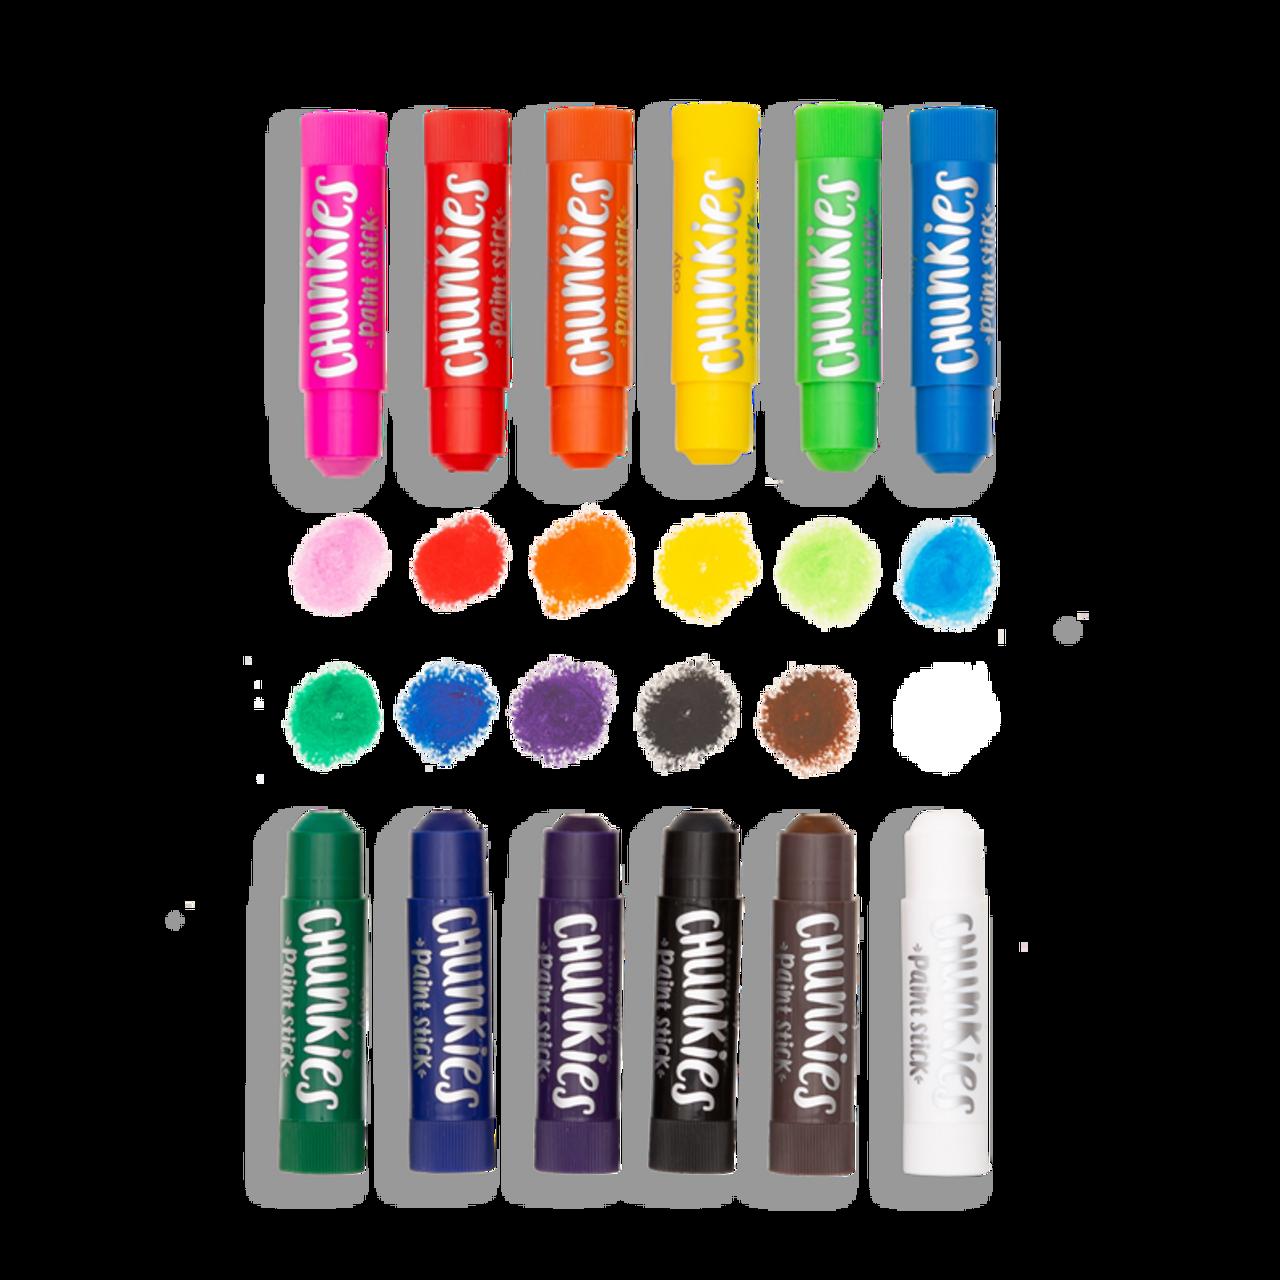 Chunkies Paint Sticks - Set of 12